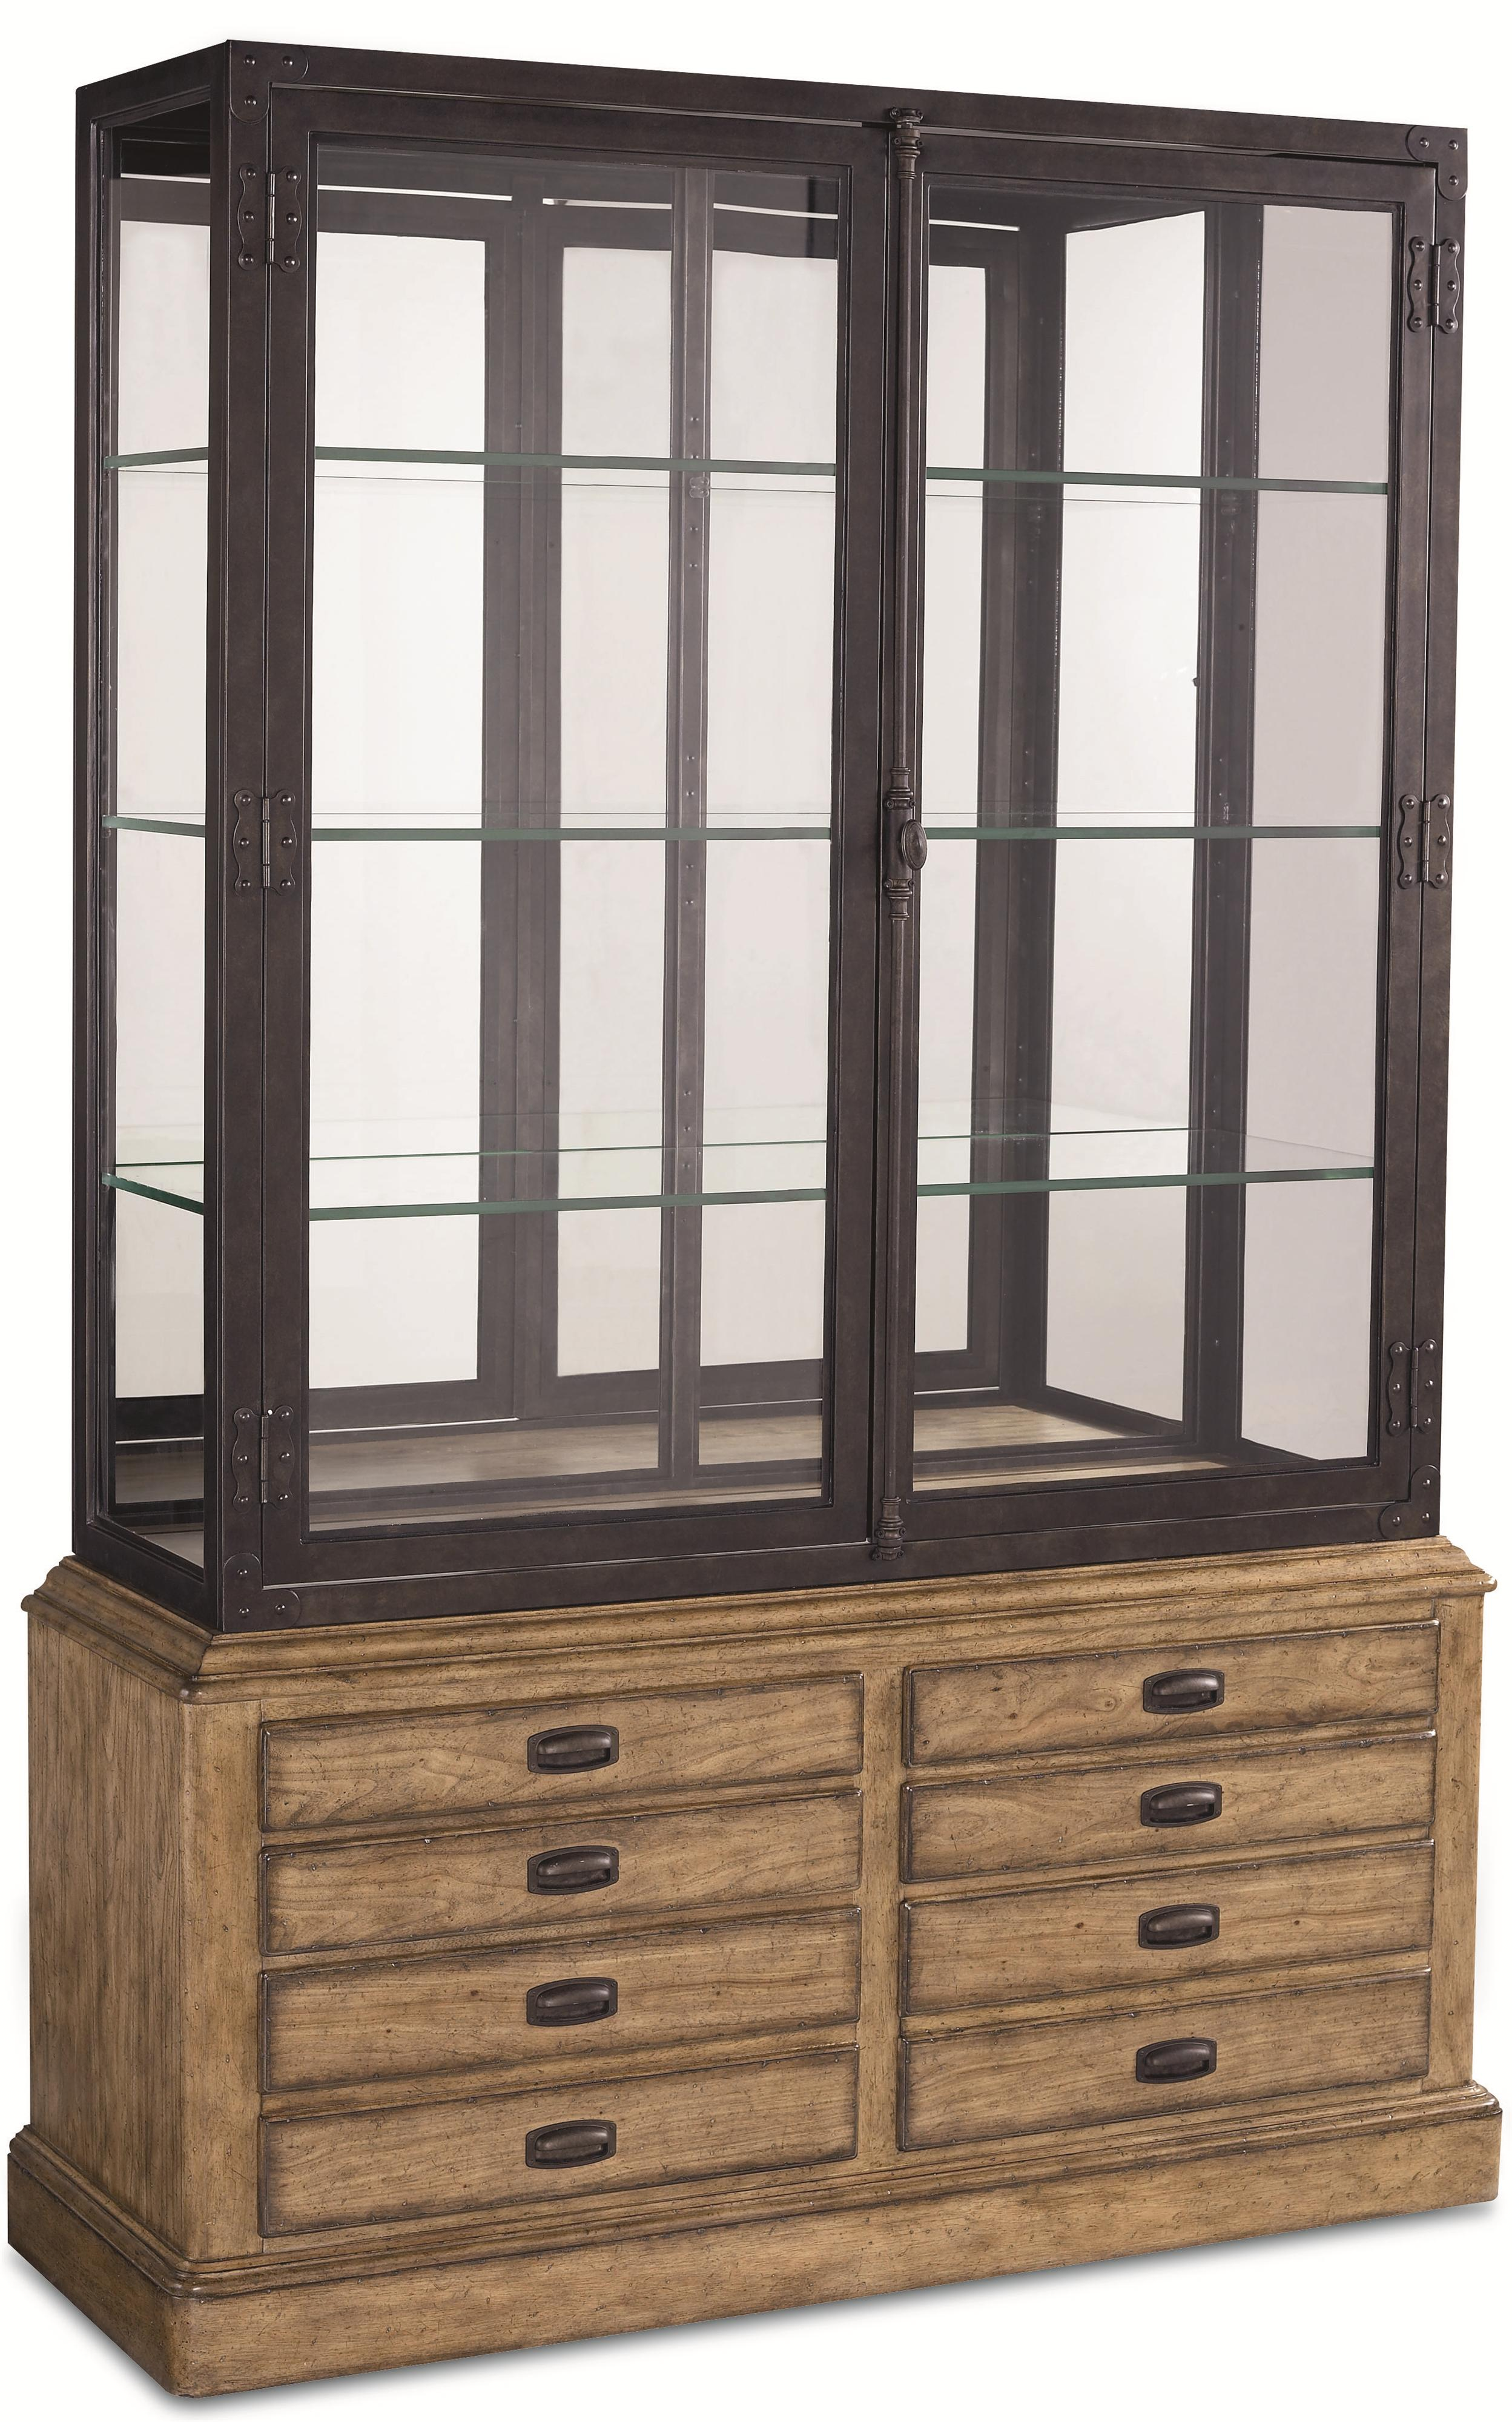 Hutch Display Cabinet Thomasviller Reinventions Visualite Display Cabinet Dunk